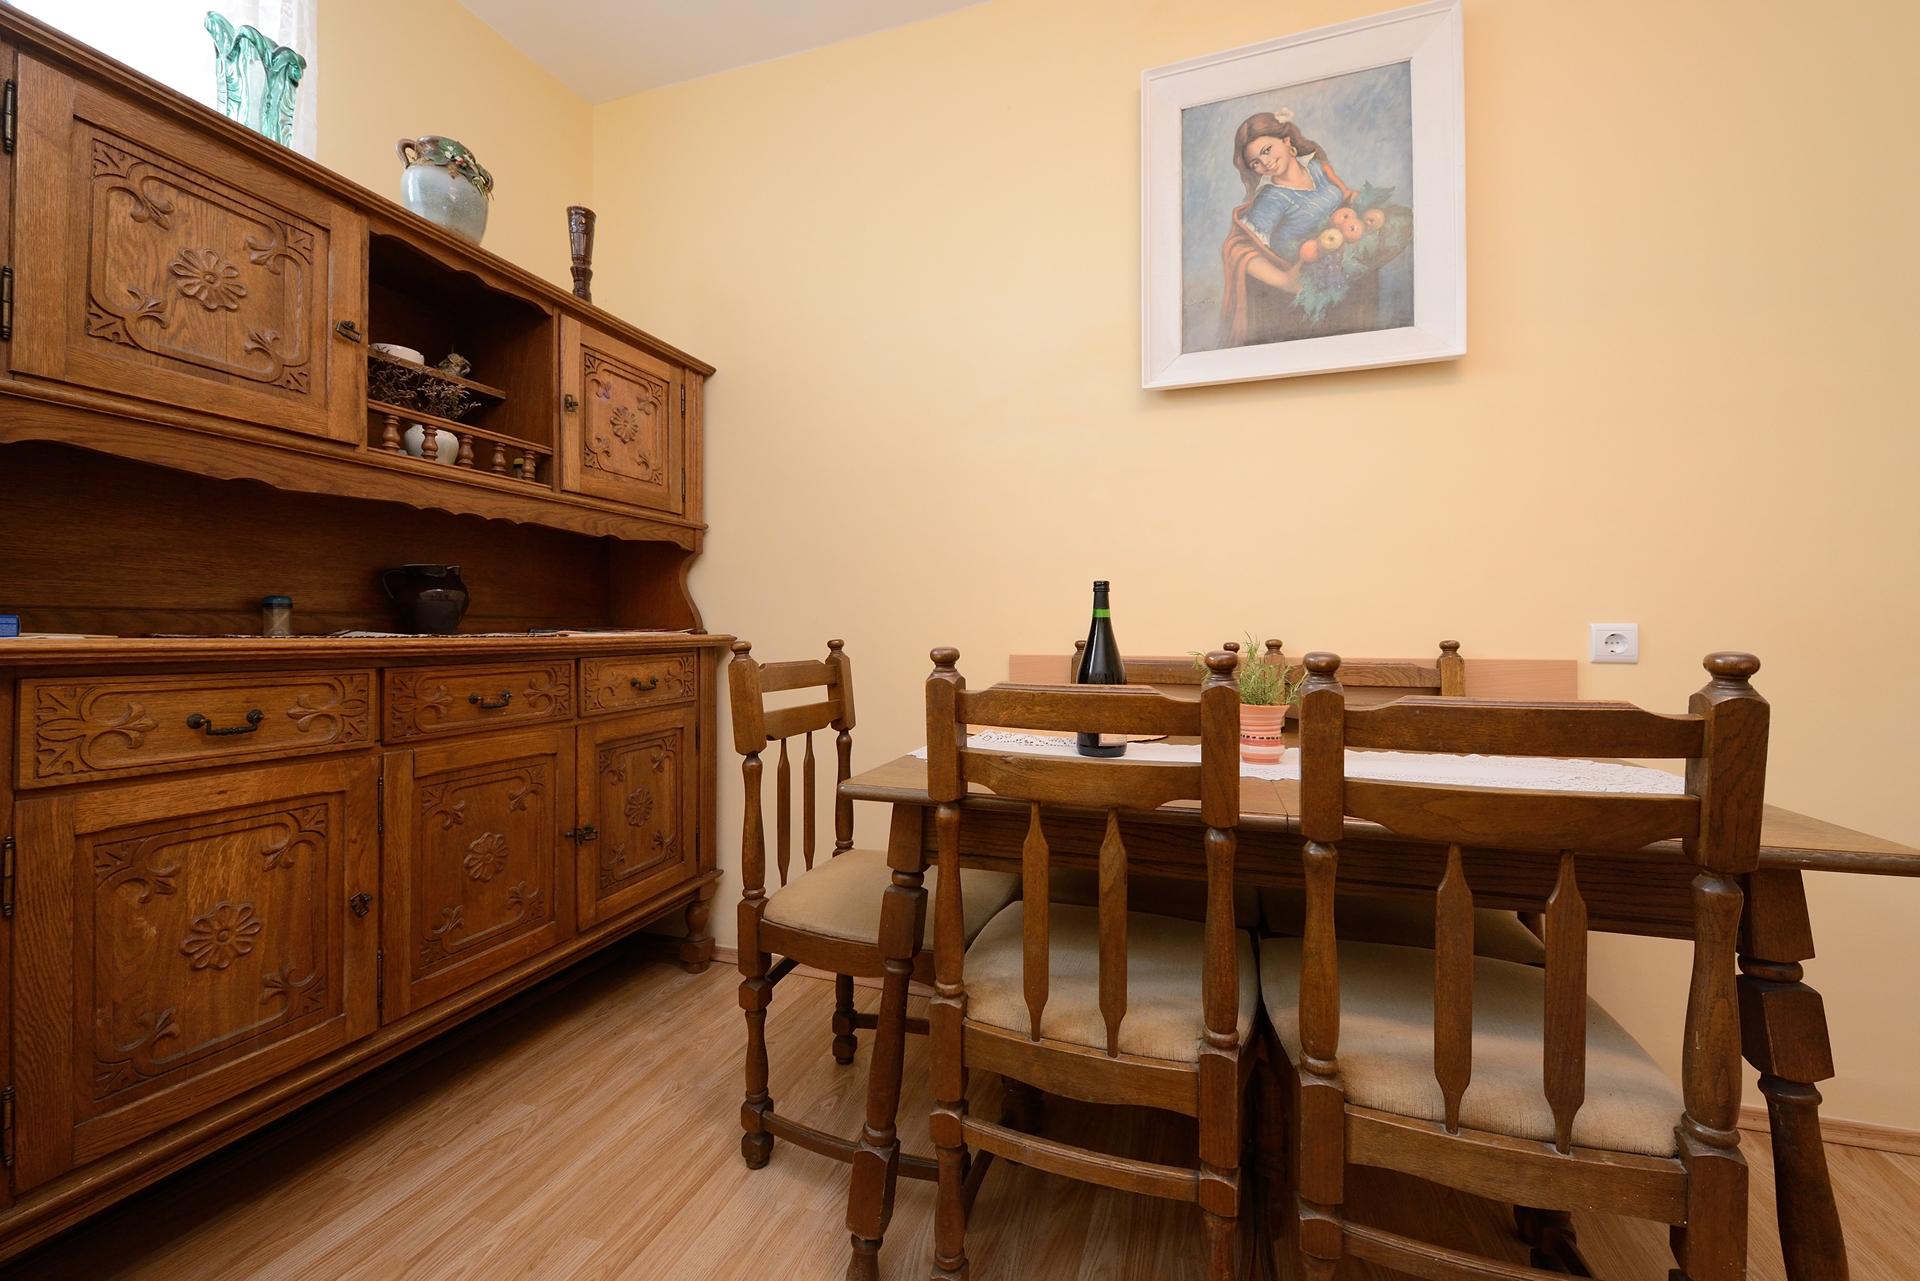 Martin - Lukoran - Vakantiehuizen, villa´s Kroatië - H(8): eetkamer